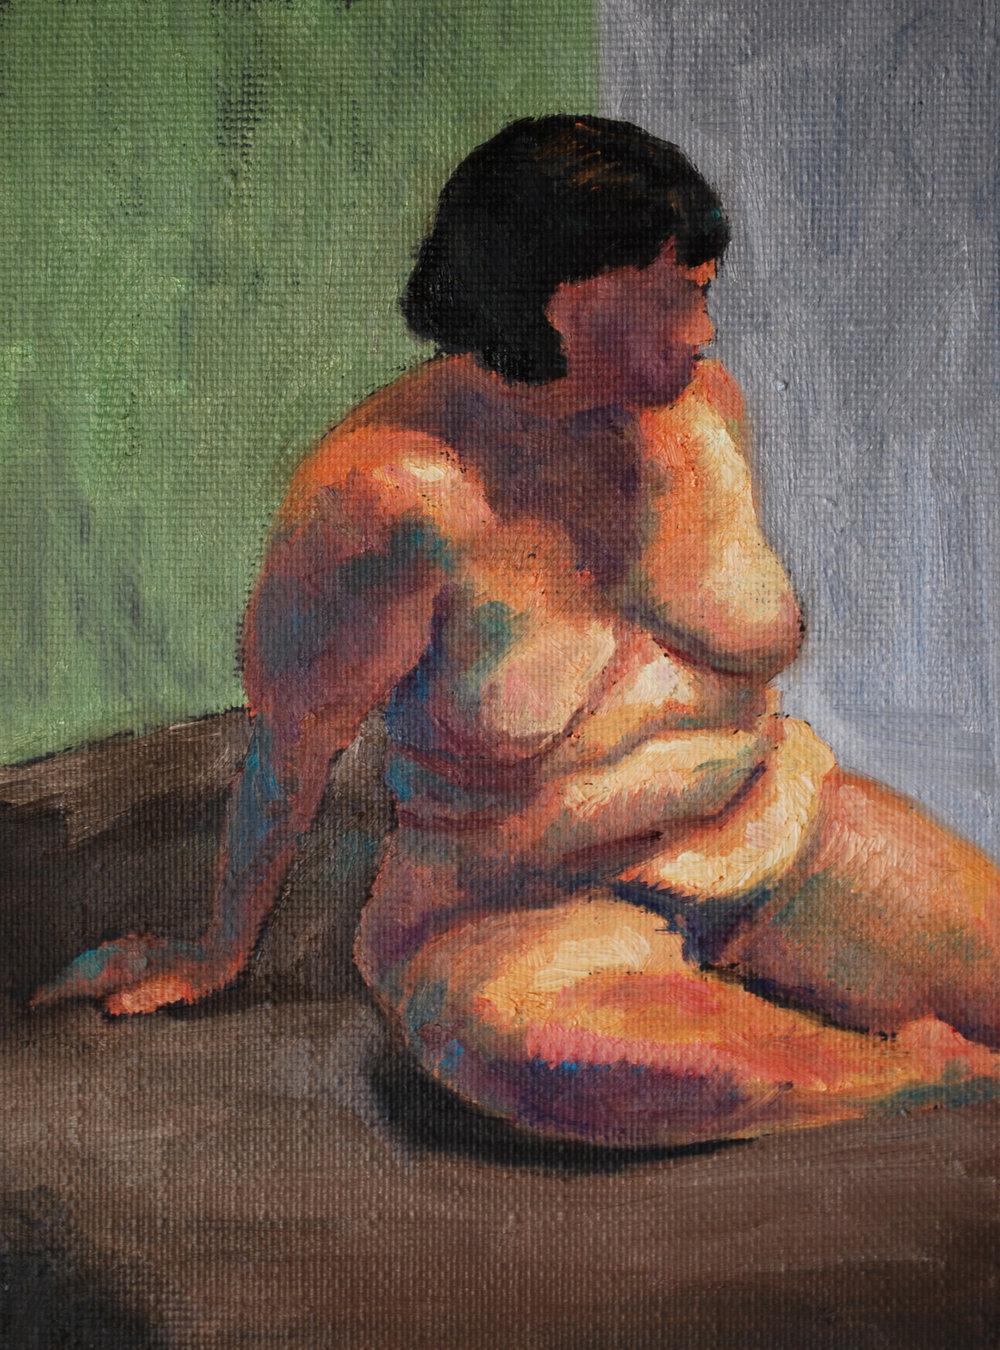 20100420-figure-study-9x12.jpg